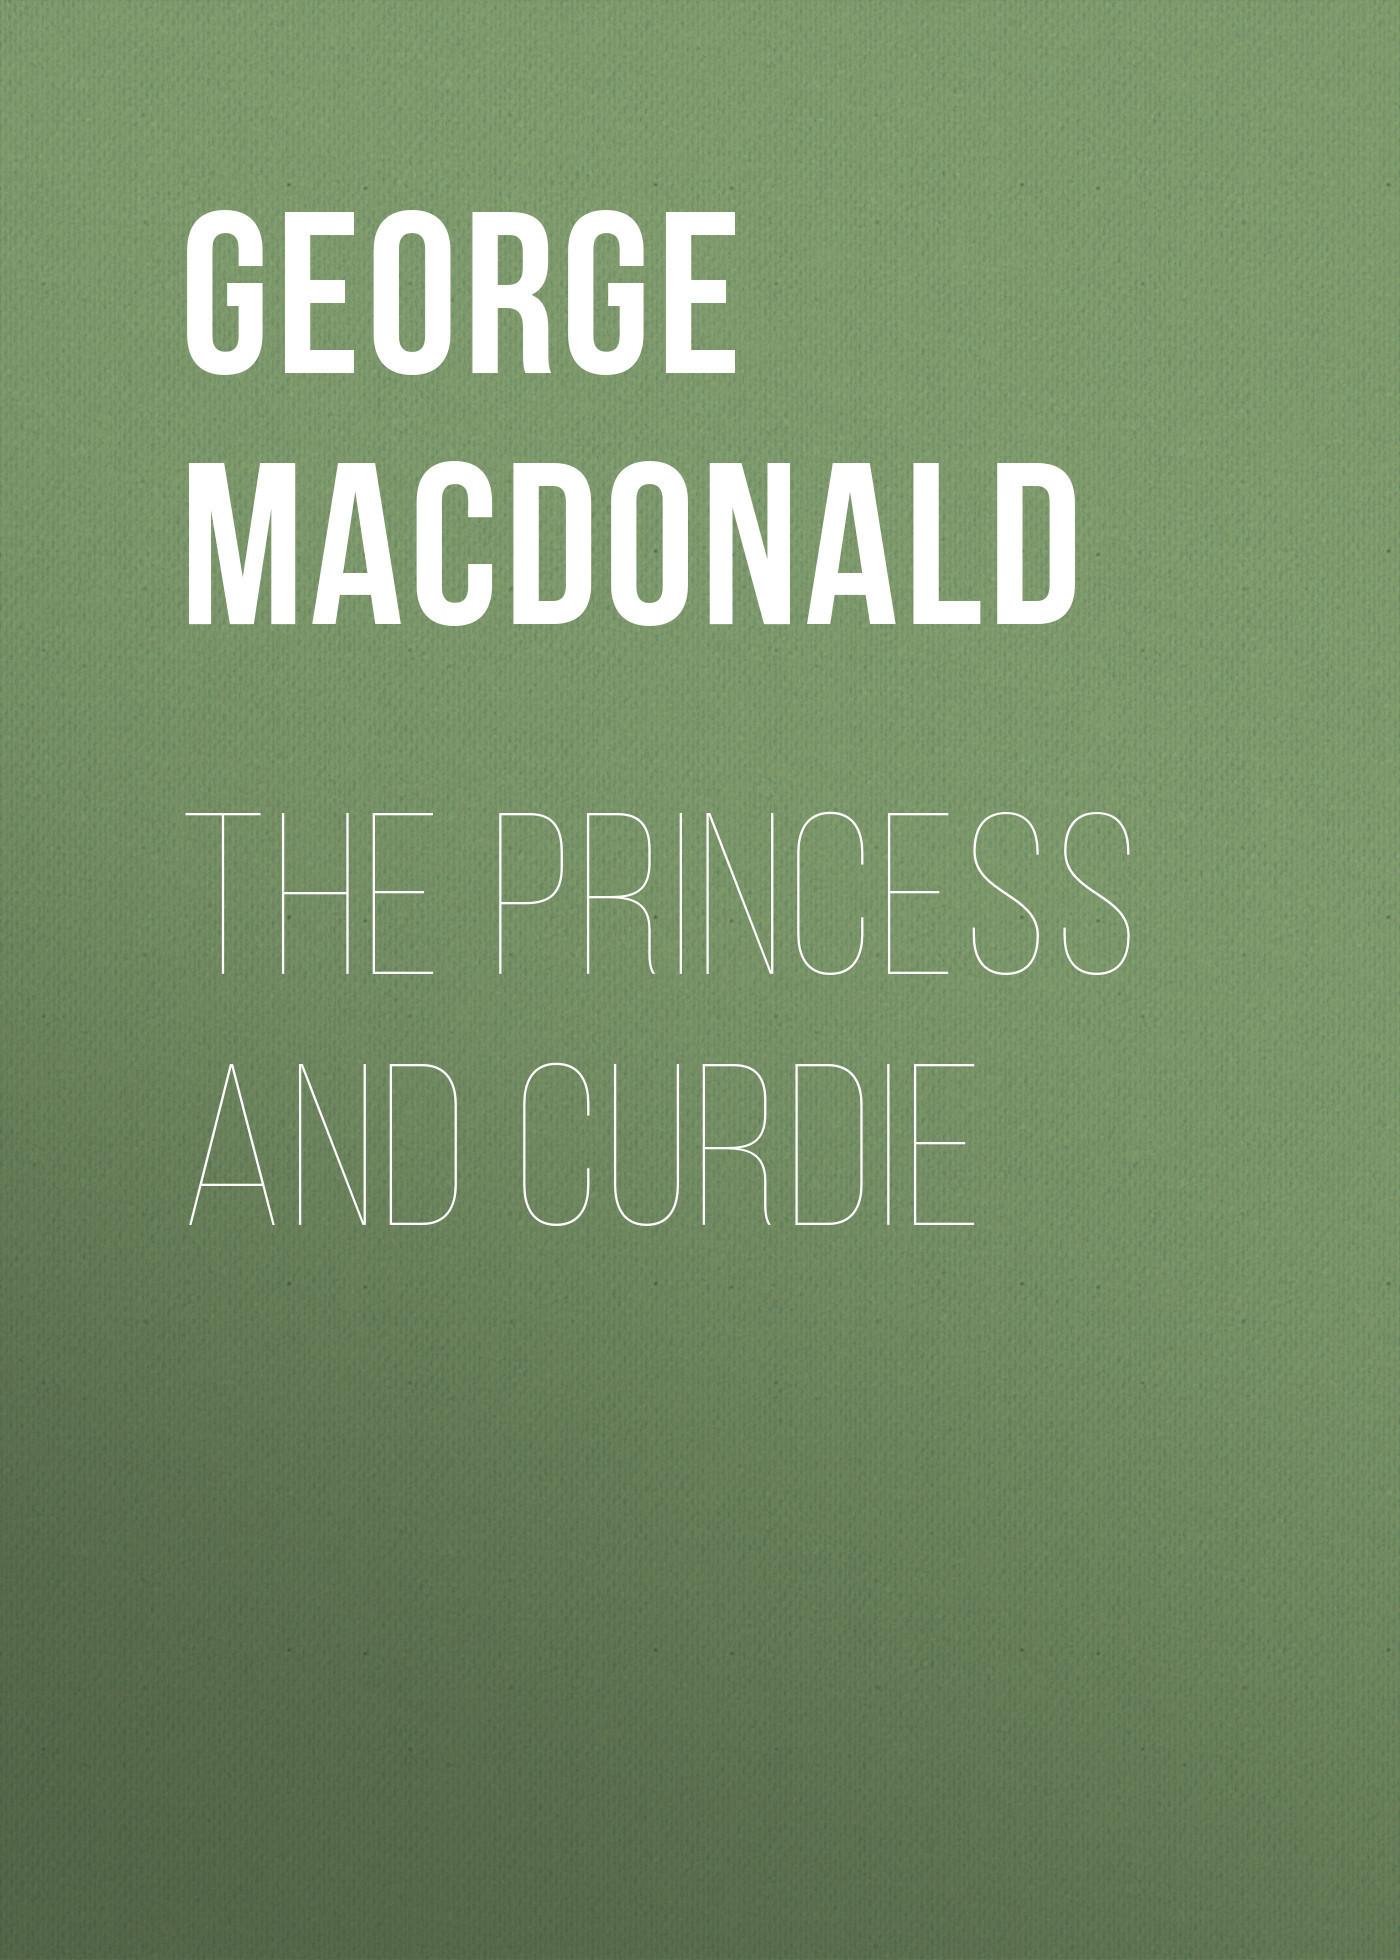 George MacDonald The Princess and Curdie macdonald g the princess and curdie